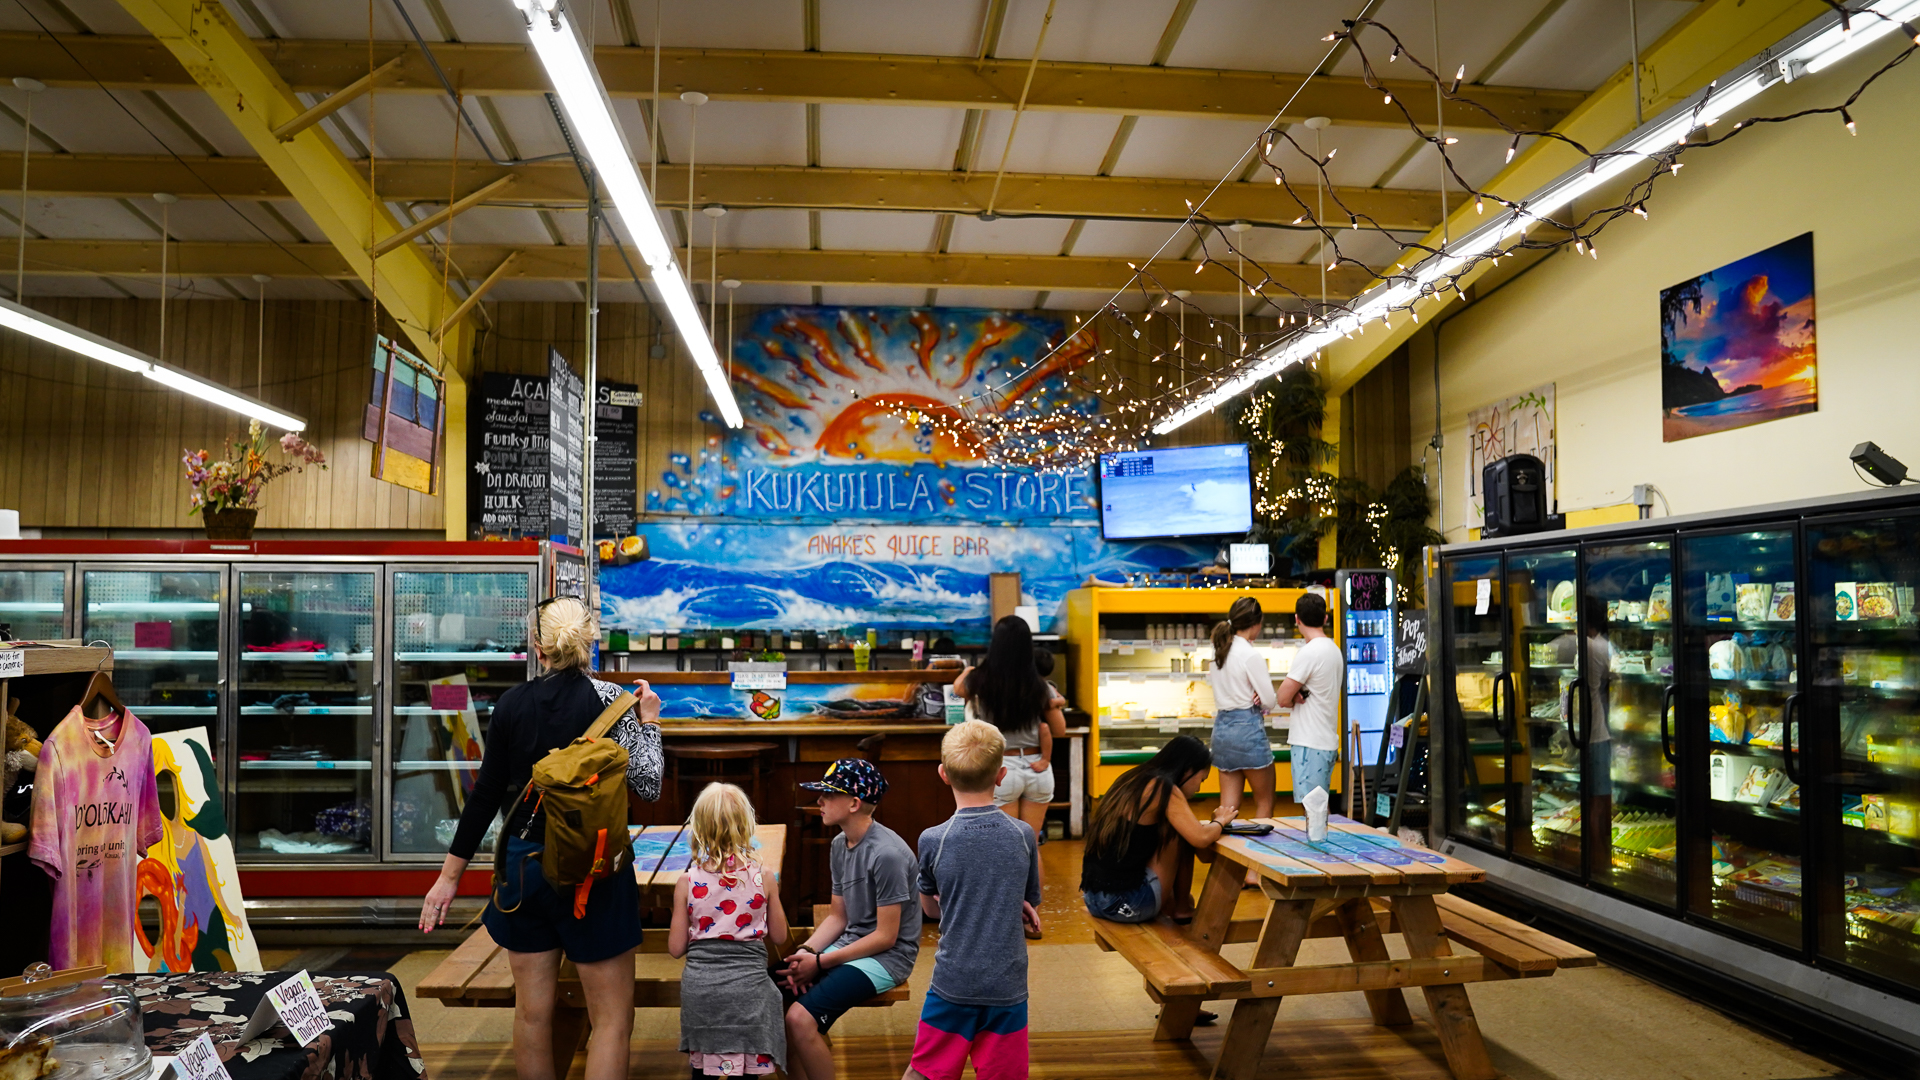 Kauai Kukuiula Mom and Pop Market Anakes Juice Bar Customers